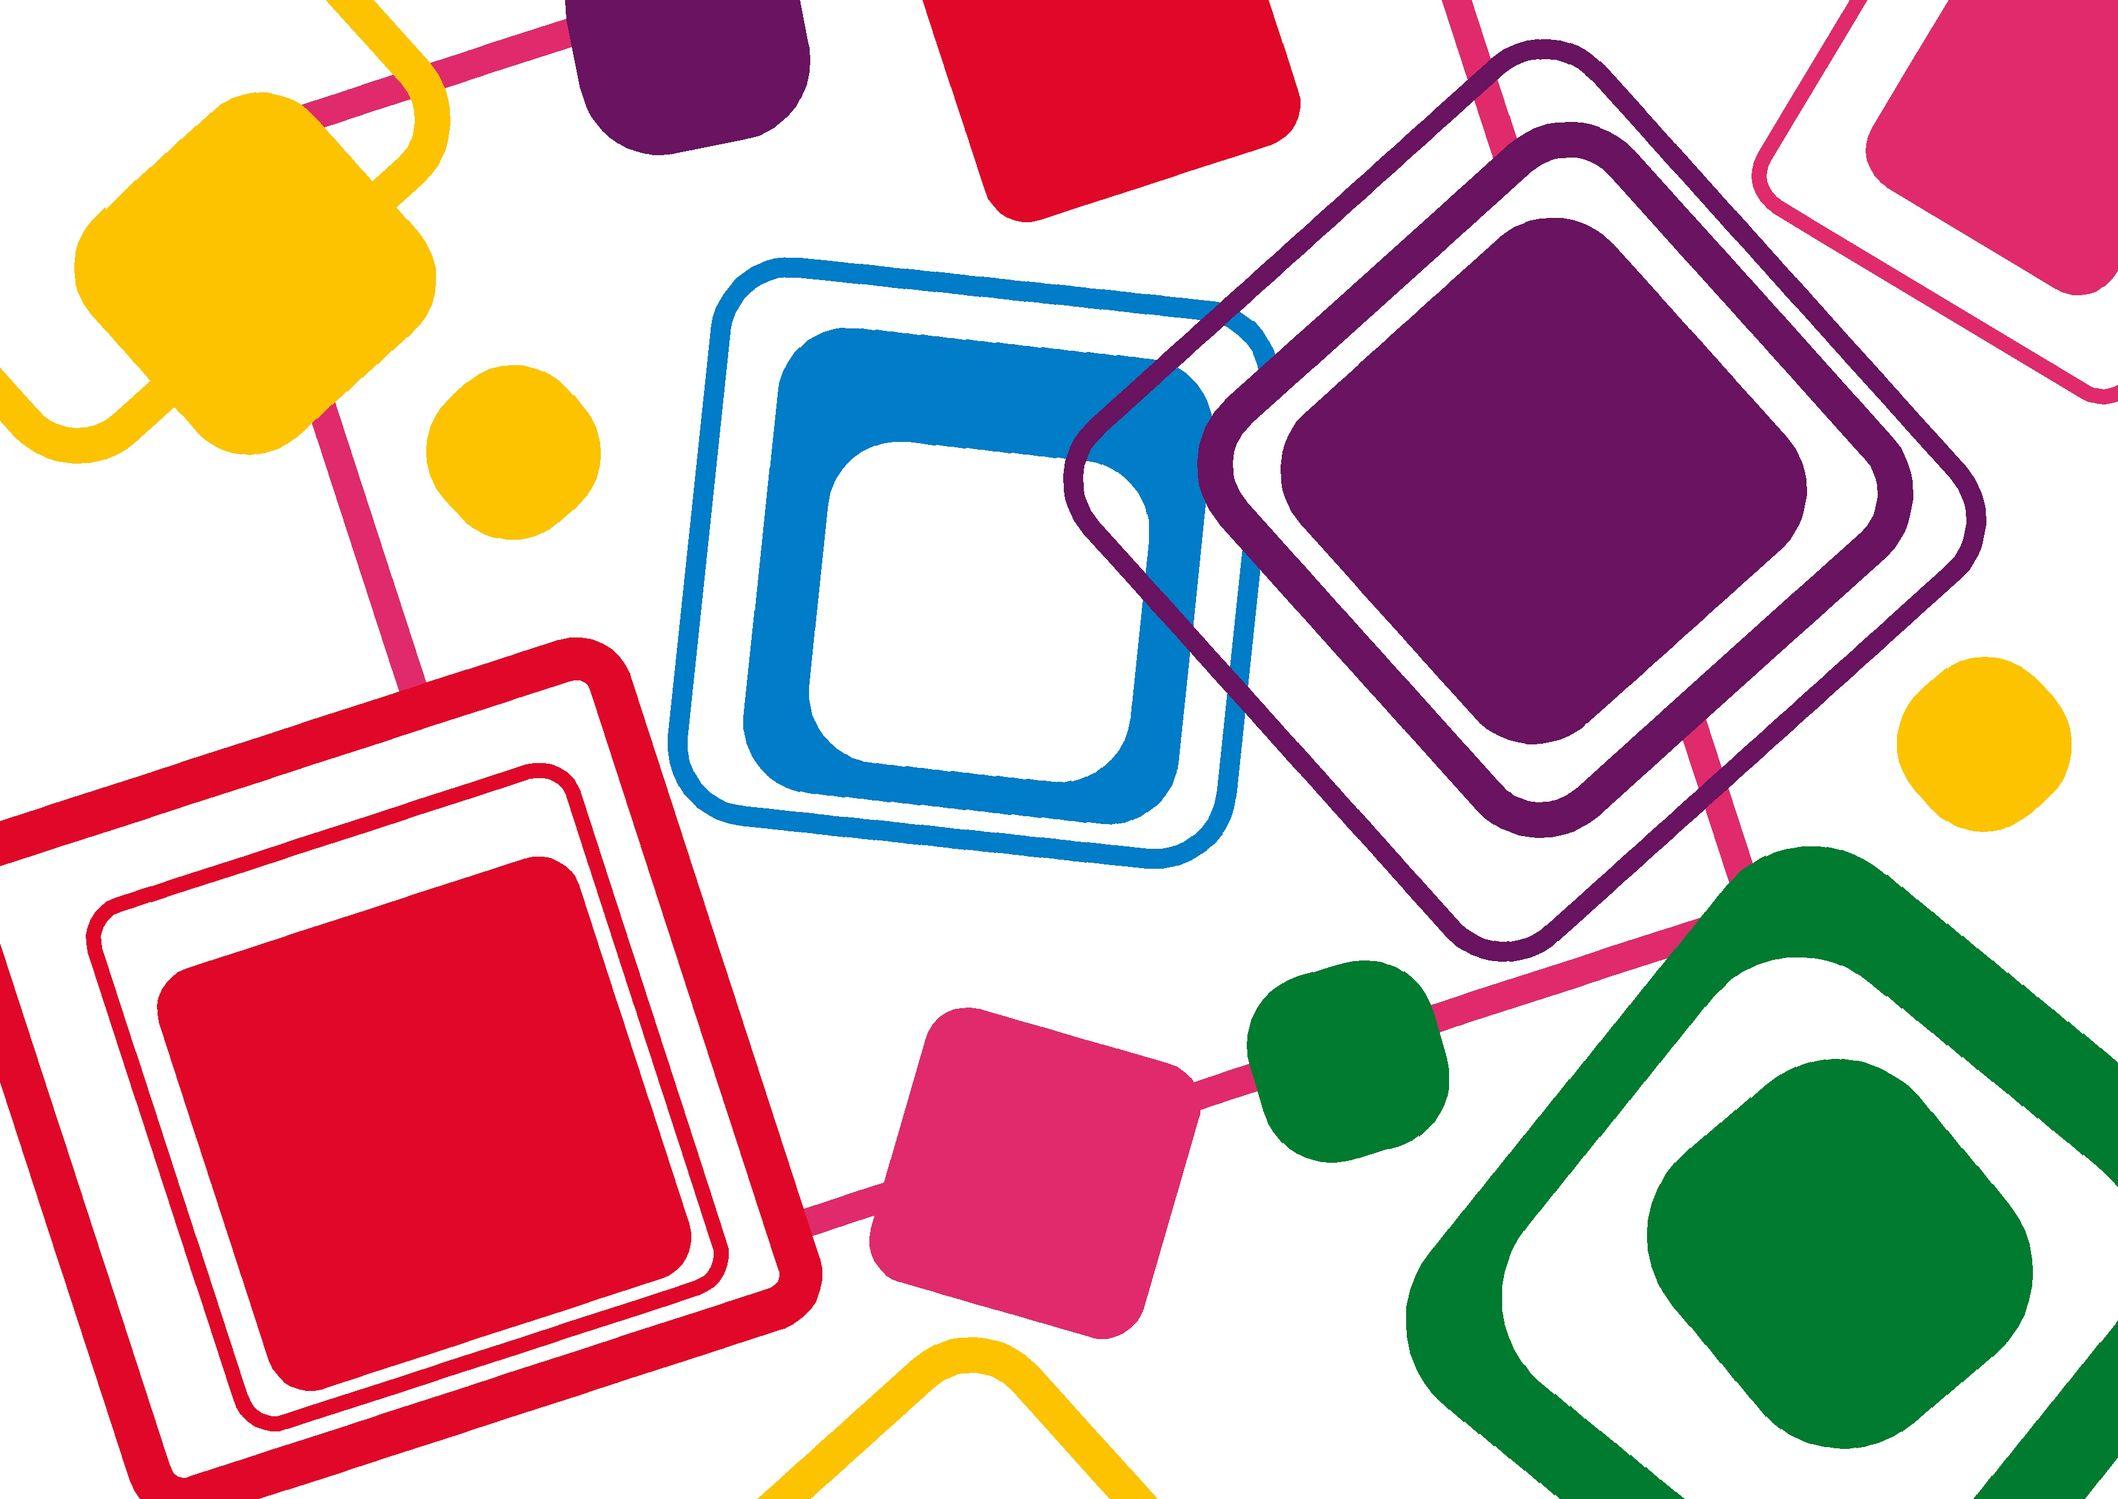 Bild mit Farben, Kunst, Rosa, Magenta, Abstrakt, Abstrakte Kunst, Abstrakte Malerei, Kunstwerk, Retro, Abstraktes